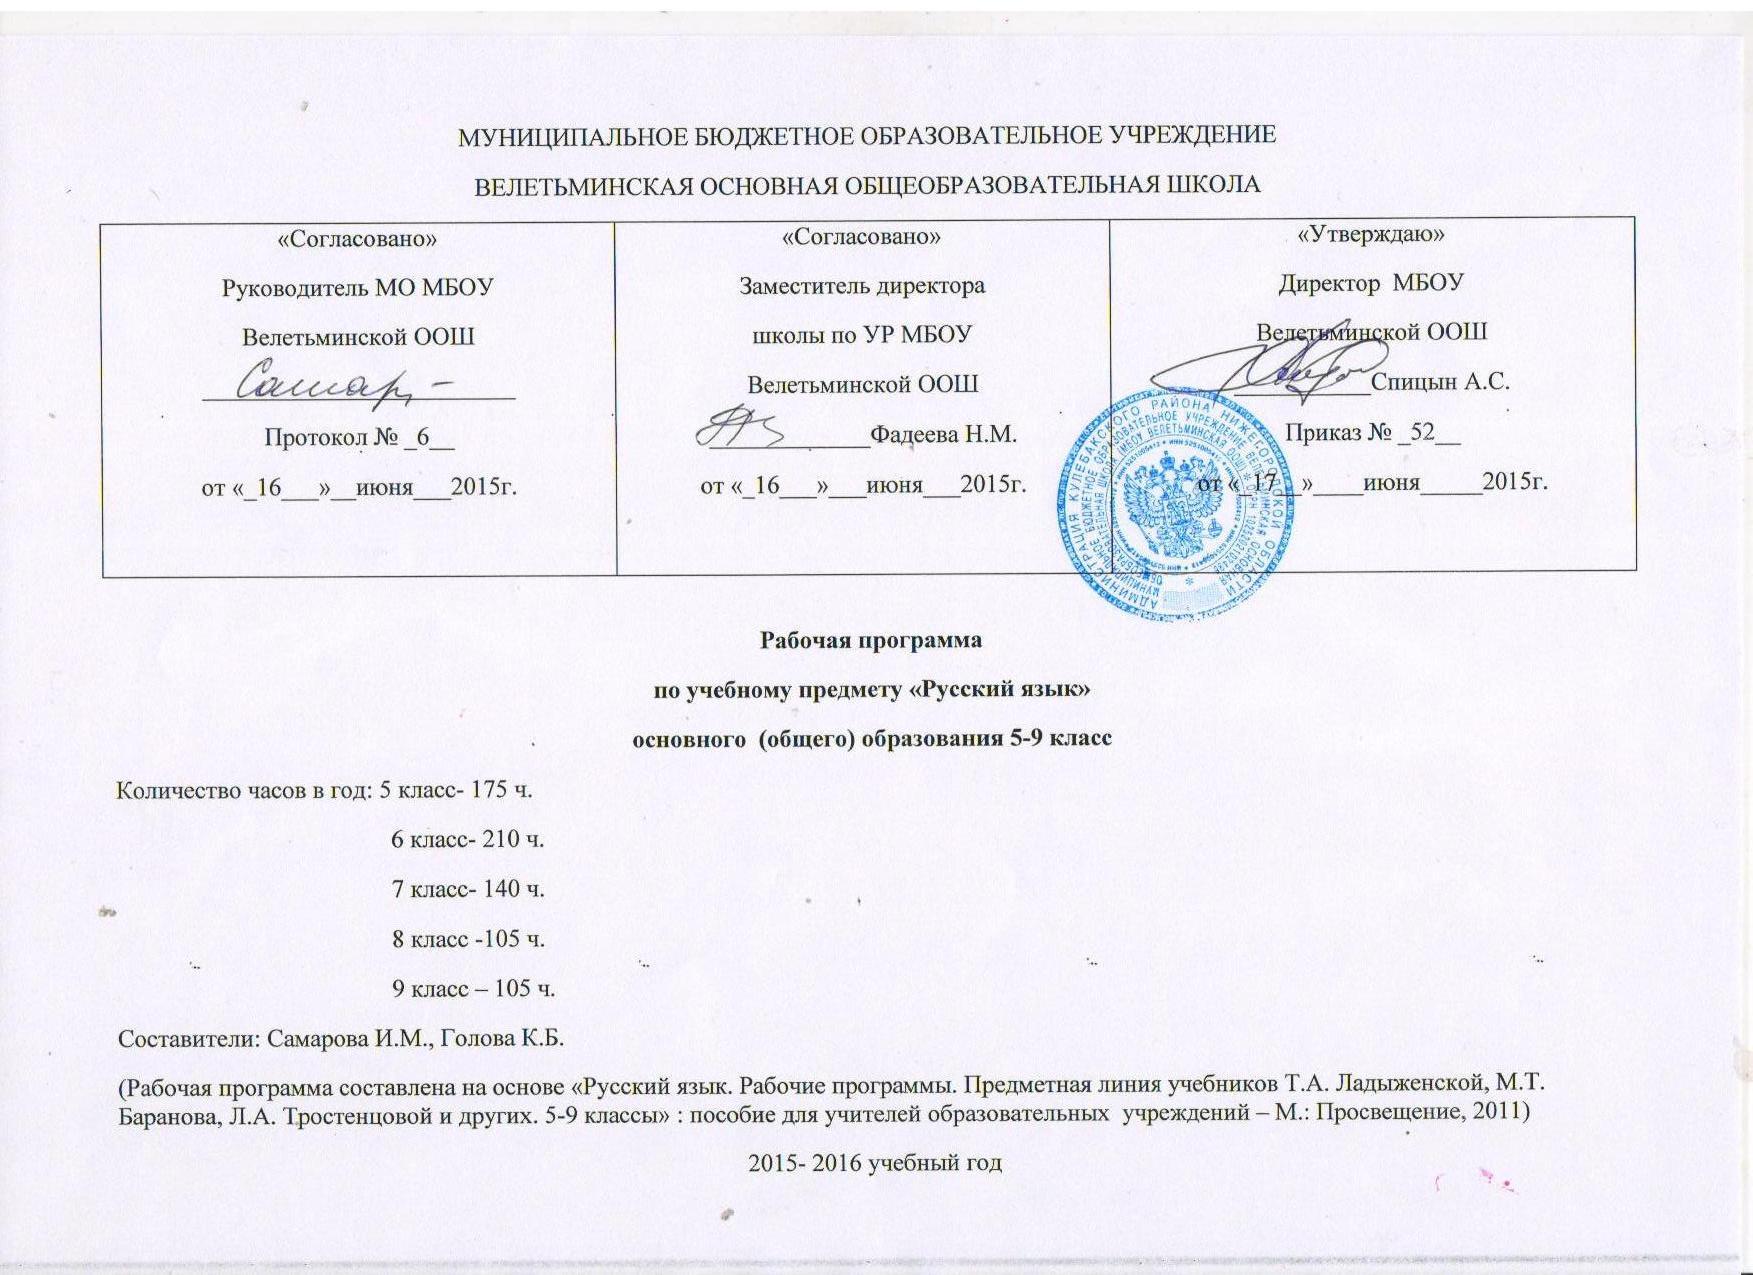 C:\Documents and Settings\User\Рабочий стол\Кристина\1.jpg